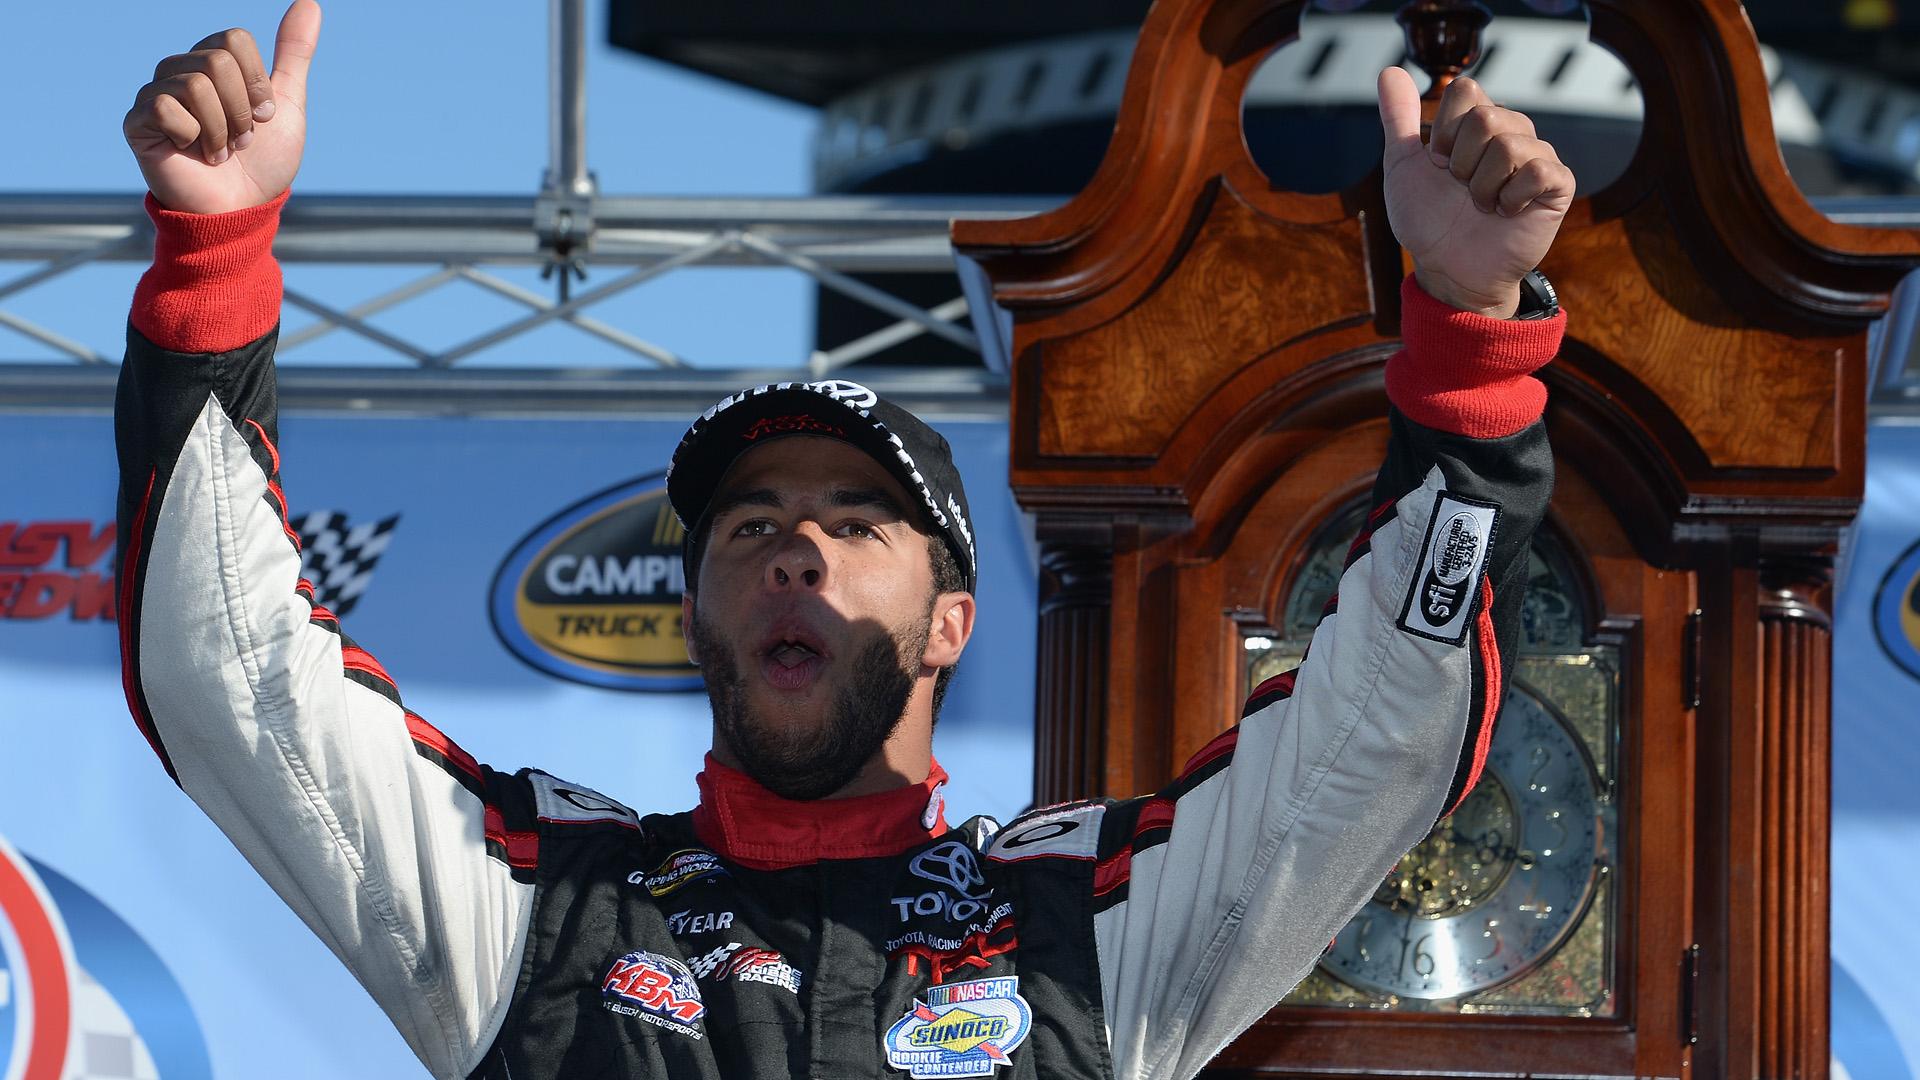 Darrell Wallace-032714-NASCAR-FTR.jpg